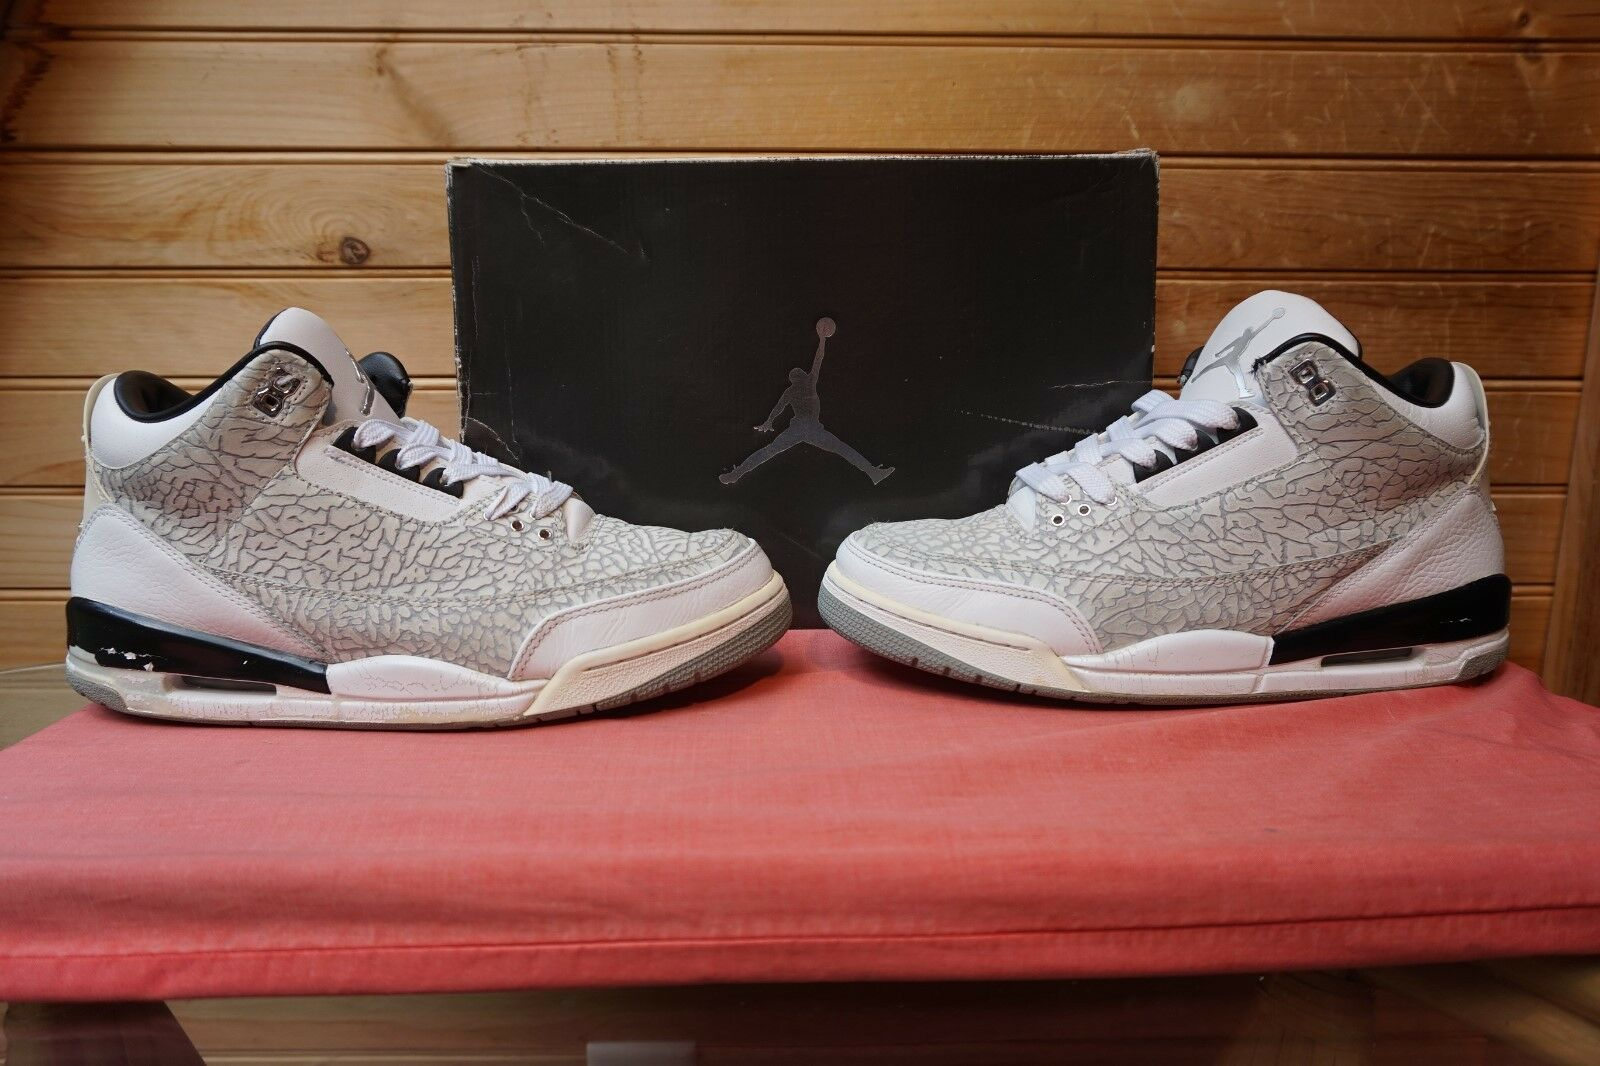 2006 Nike Air Jordan Retro 3 Flip Wht Blk Met Silver Sz 10.5 (4840) 315767-101